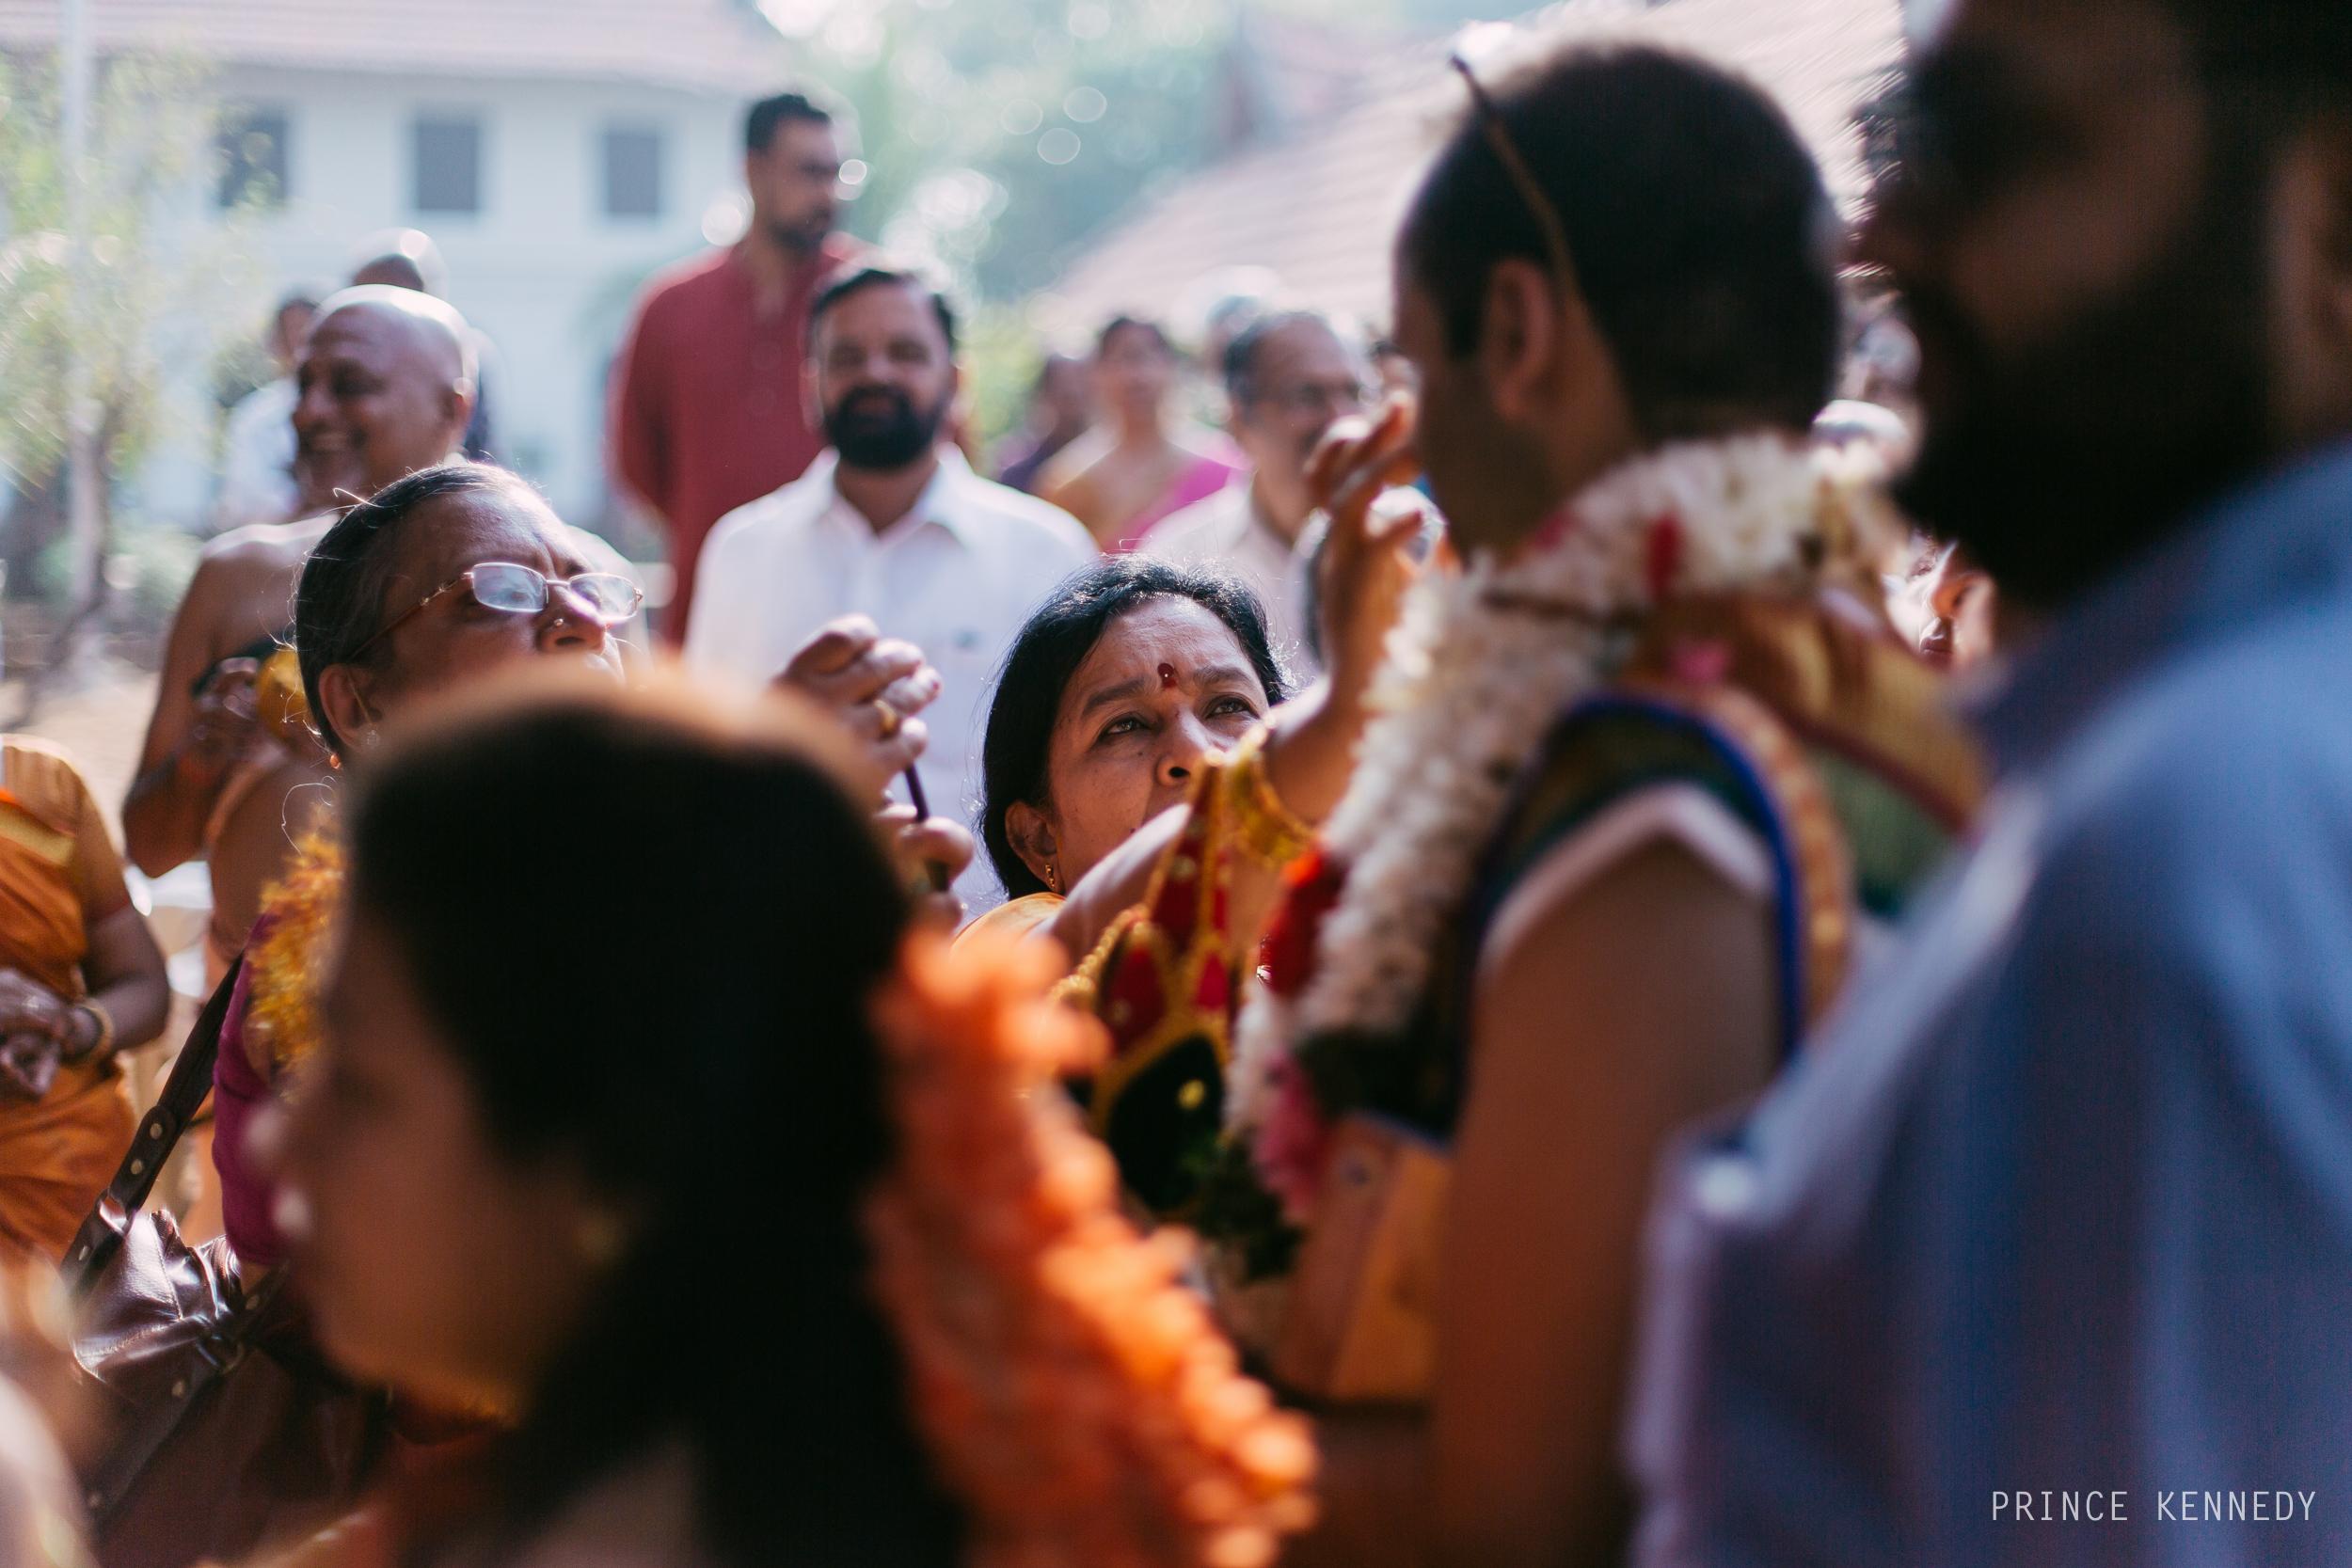 Athmajja-Nithesh-Engagement-Couple-Portrait-Portraiture-Wedding-Couple-Portrait-Chennai-Photographer-Candid-Photography-Destination-Best-Prince-Kennedy-Photography-55.jpg